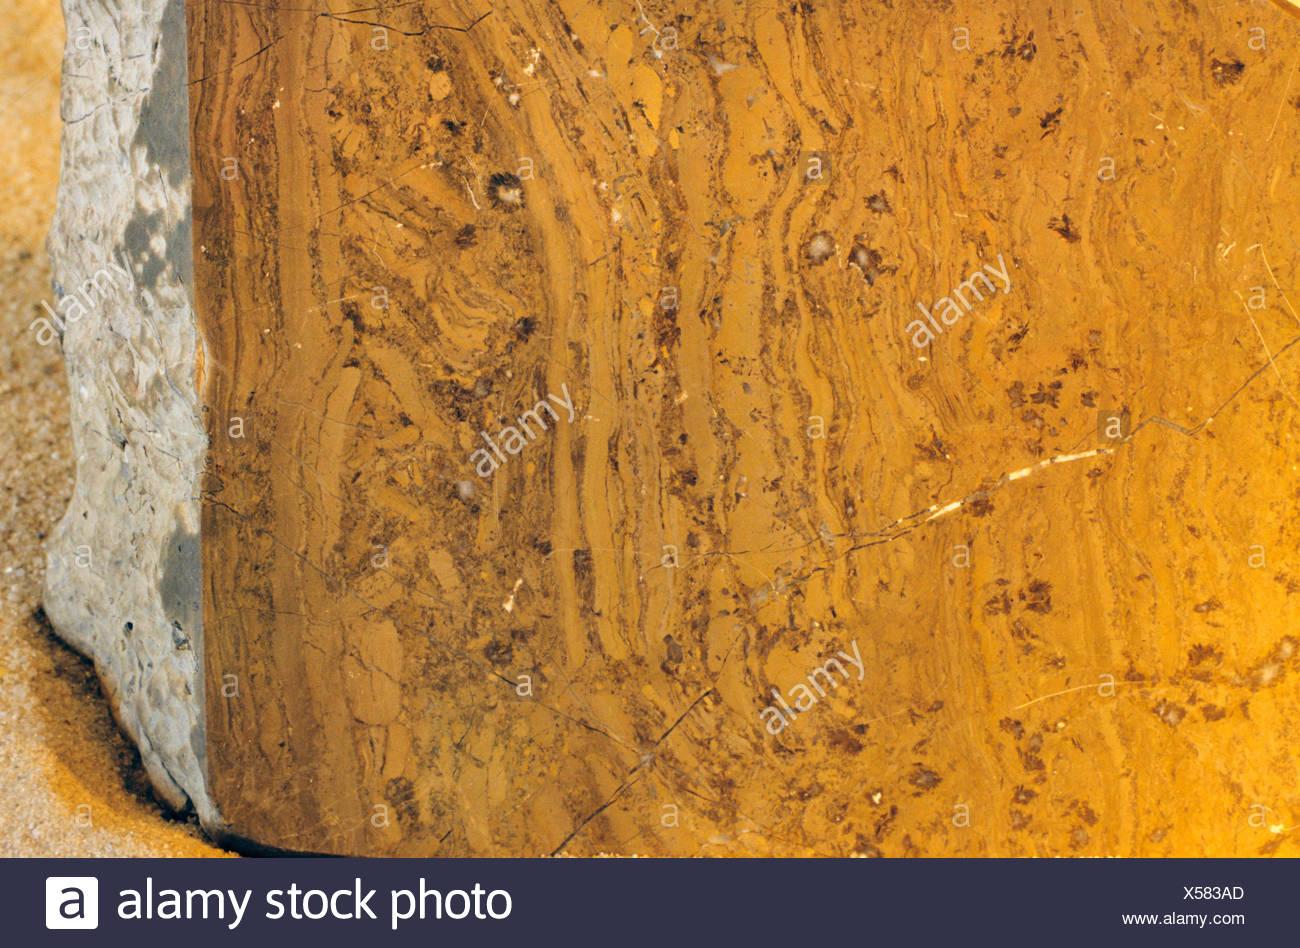 carbonatic microbial mat, Austria - Stock Image